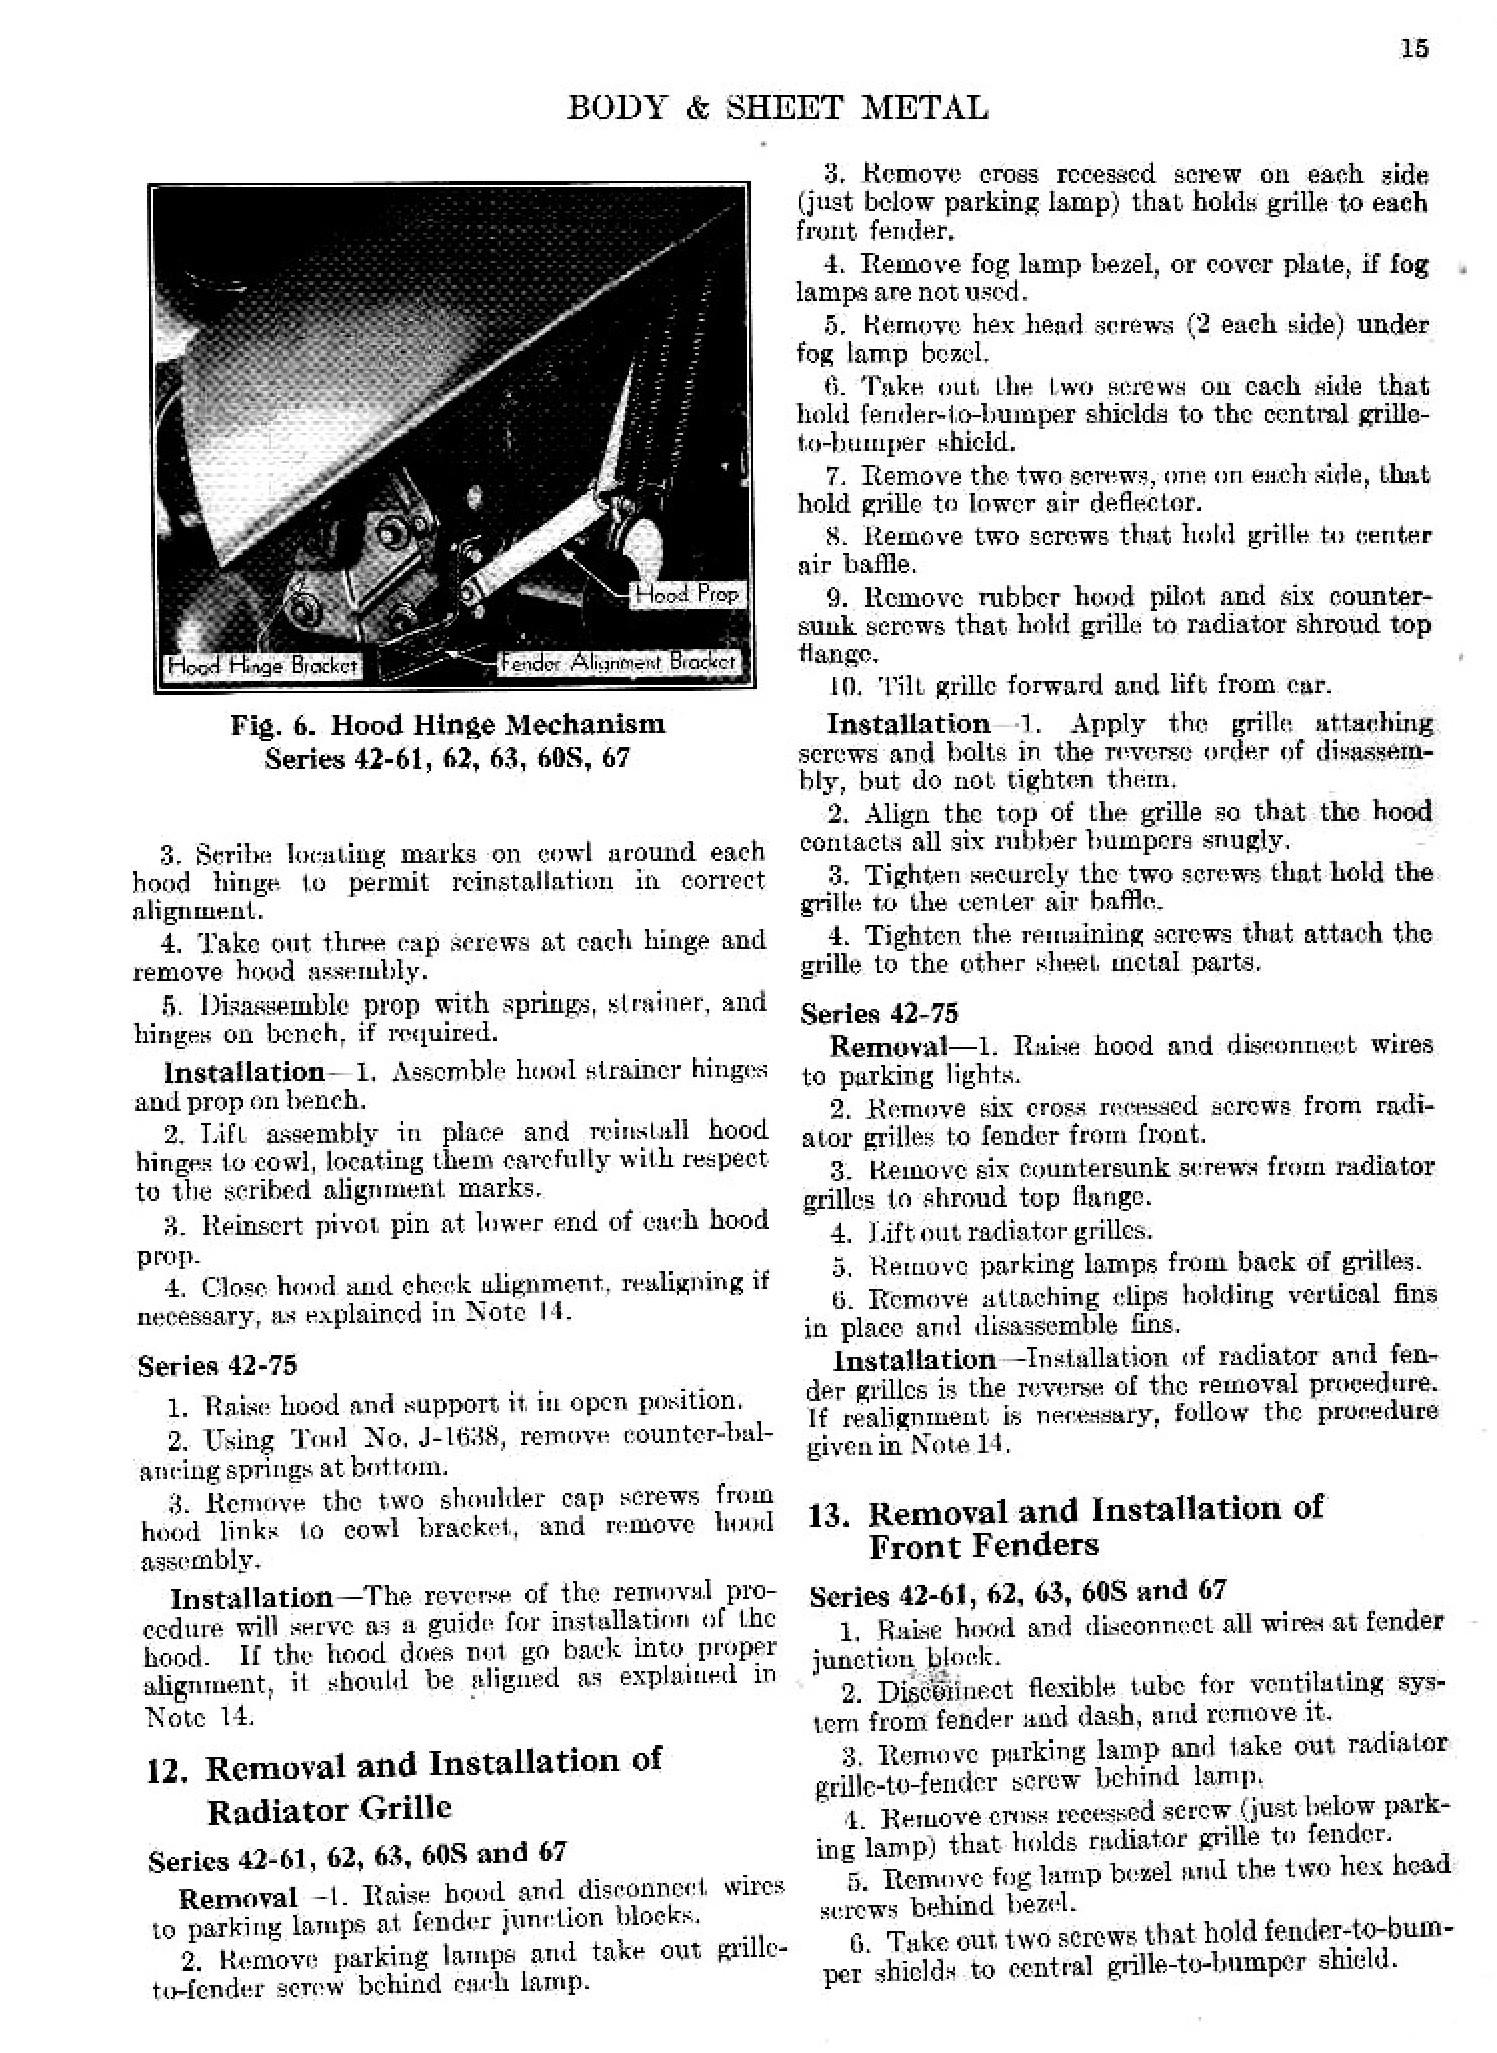 1947 Cadillac Shop Manual-Body and Sheet Metal Page 4 of 7